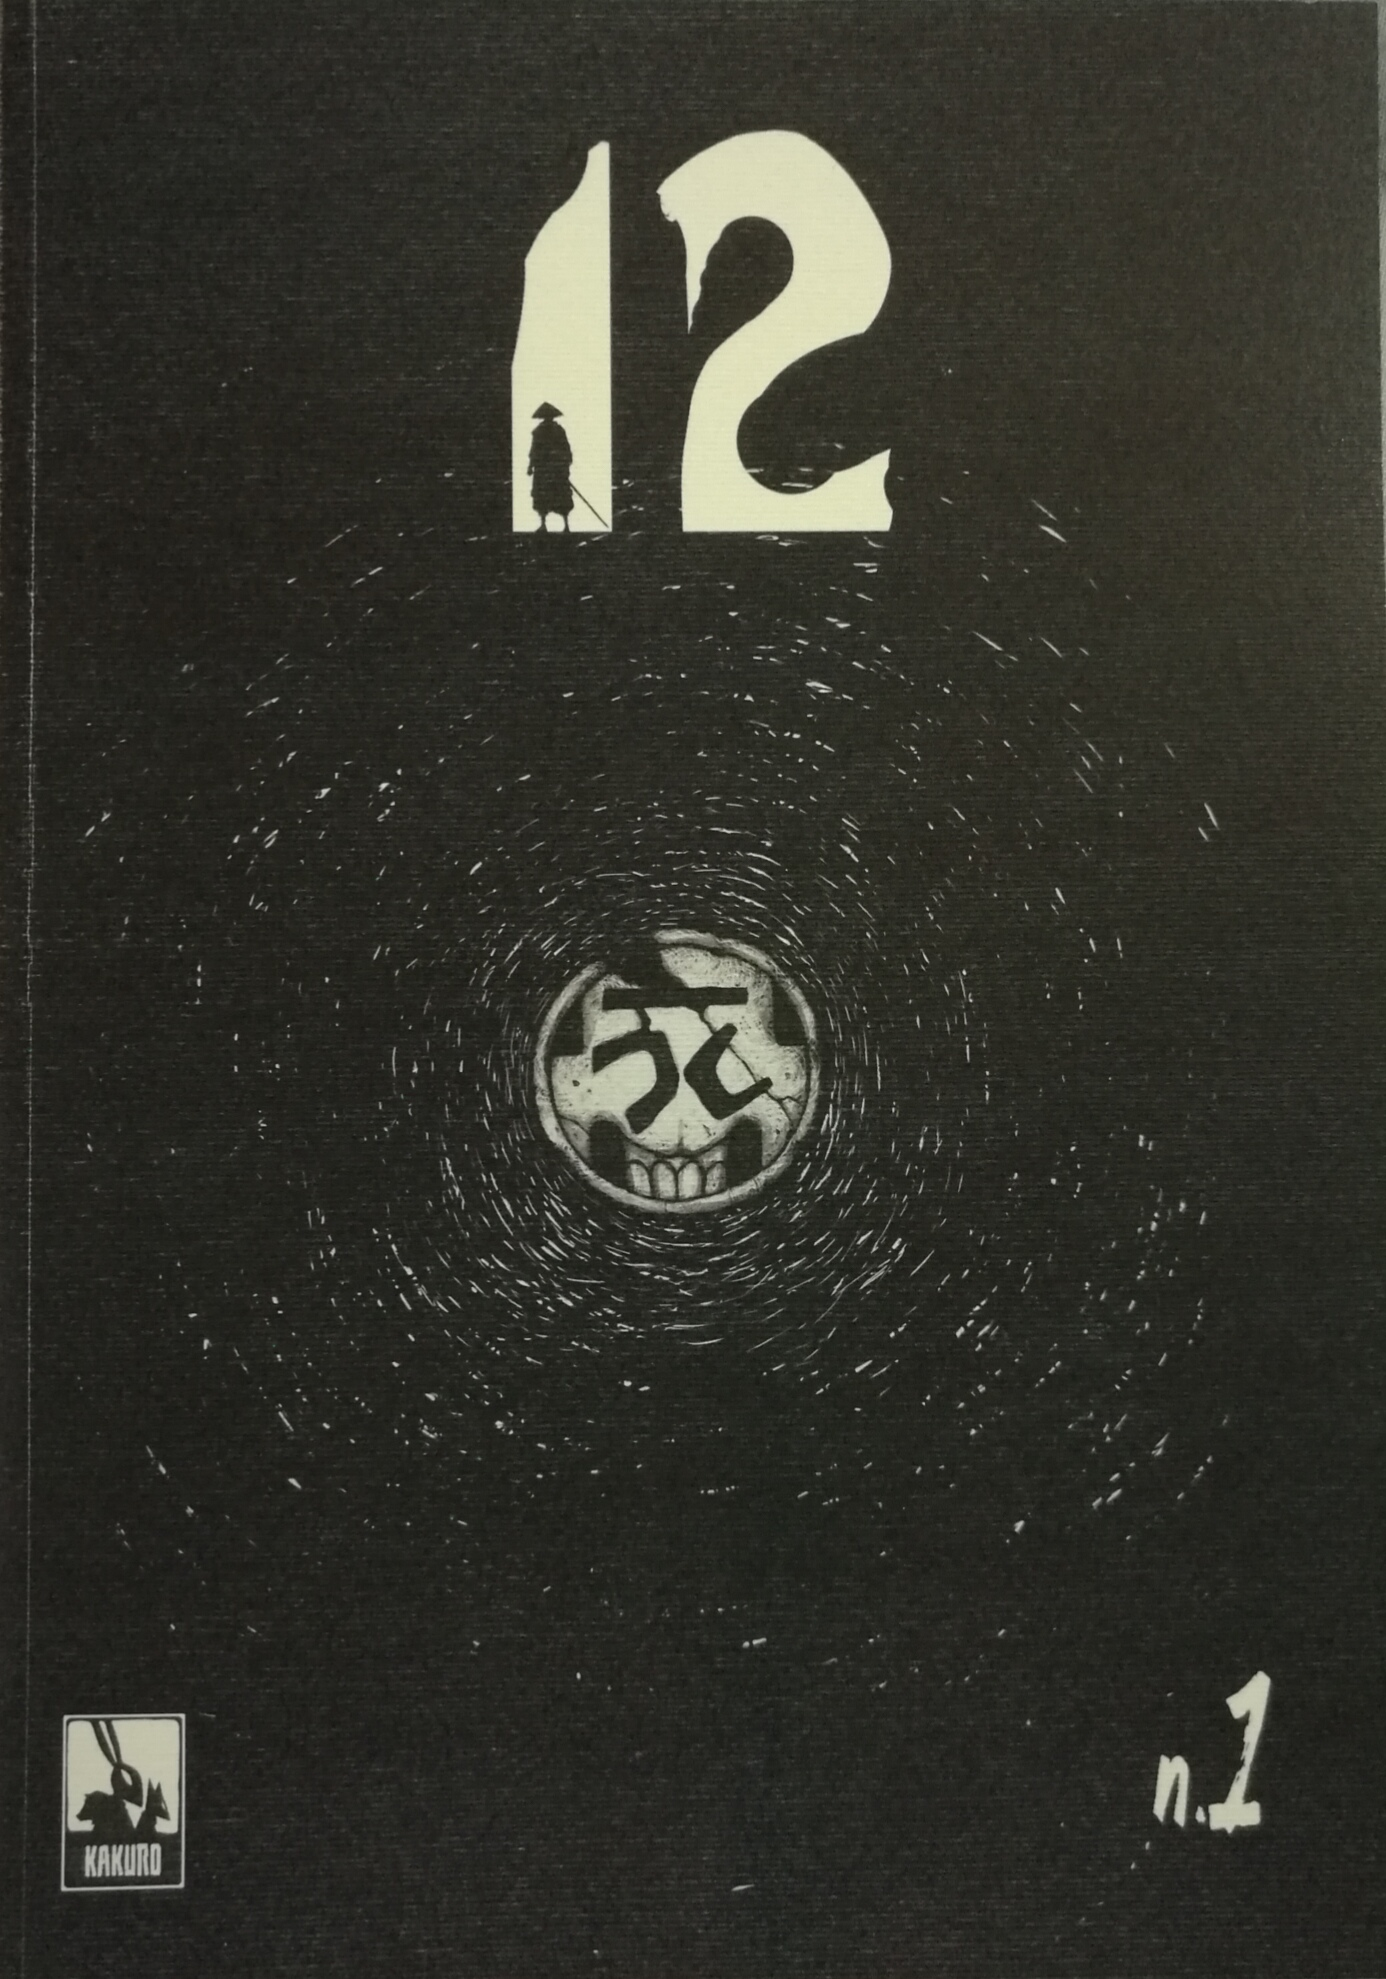 12 n. 1